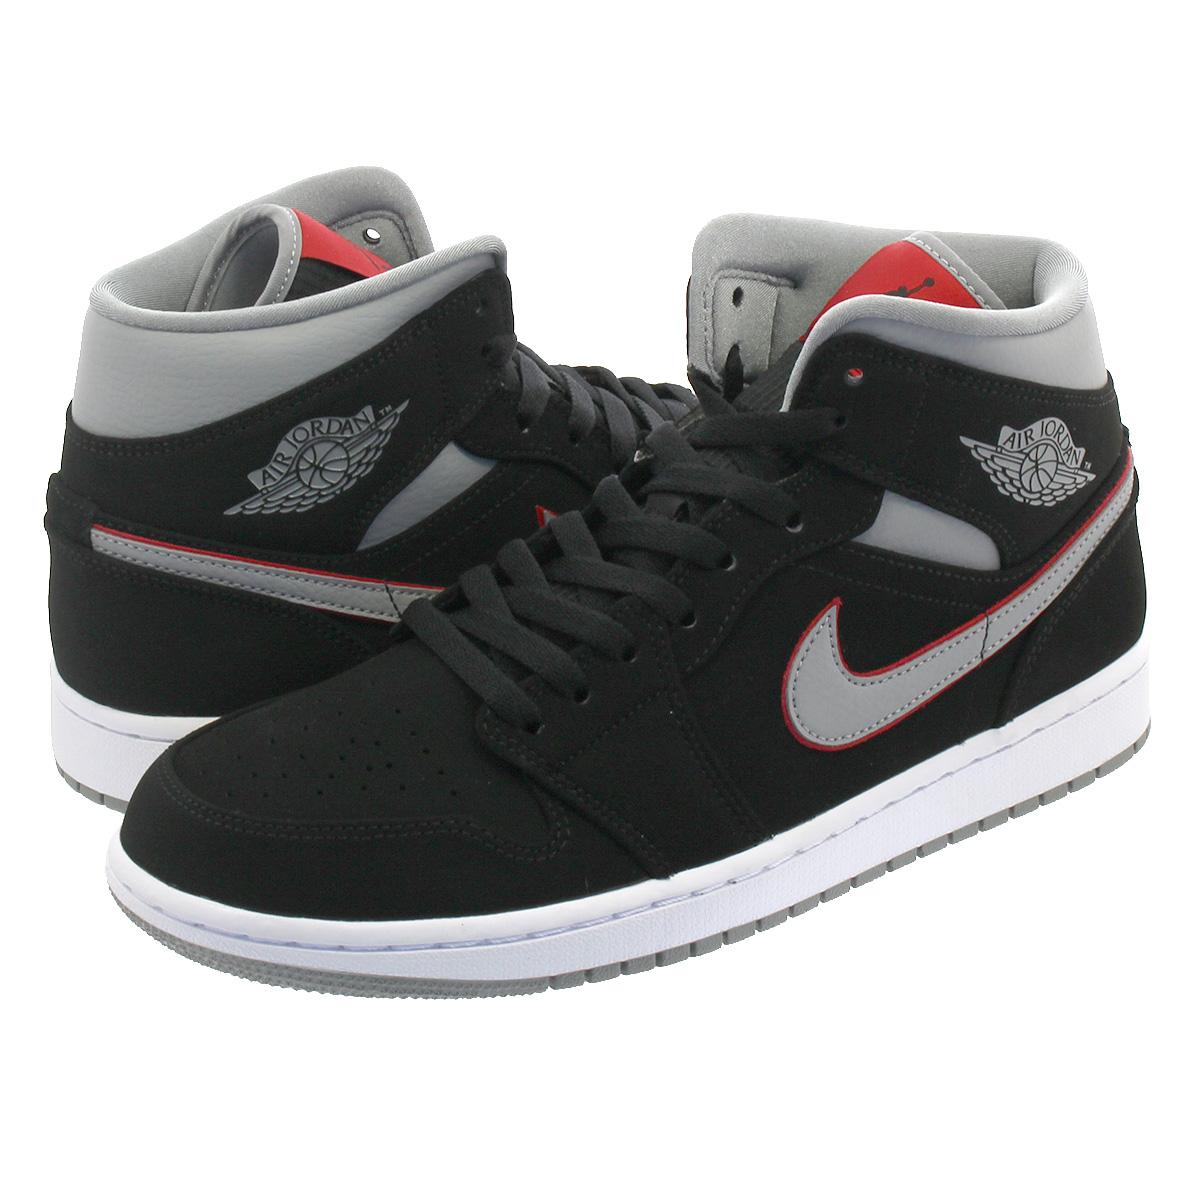 separation shoes 79296 60a09 NIKE AIR JORDAN 1 MID Nike Air Jordan 1 mid BLACK PARTICLE GREY WHITE ...